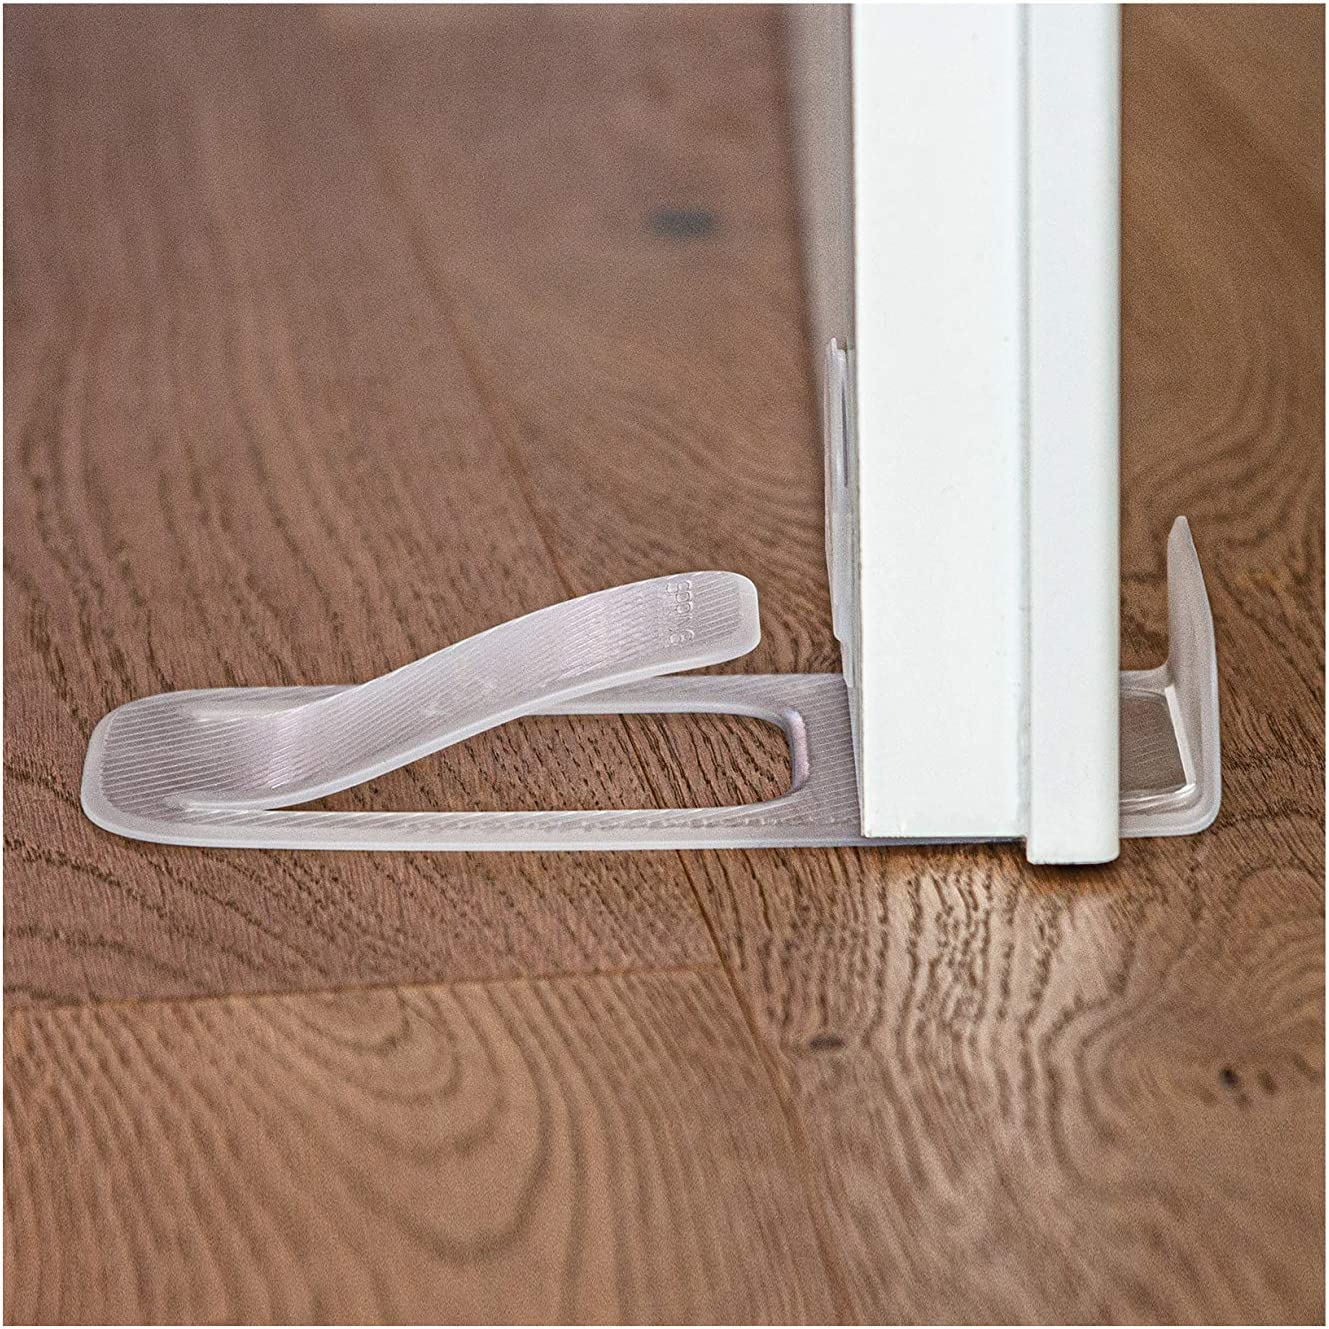 Spring - Tope para Puerta (Transparente)